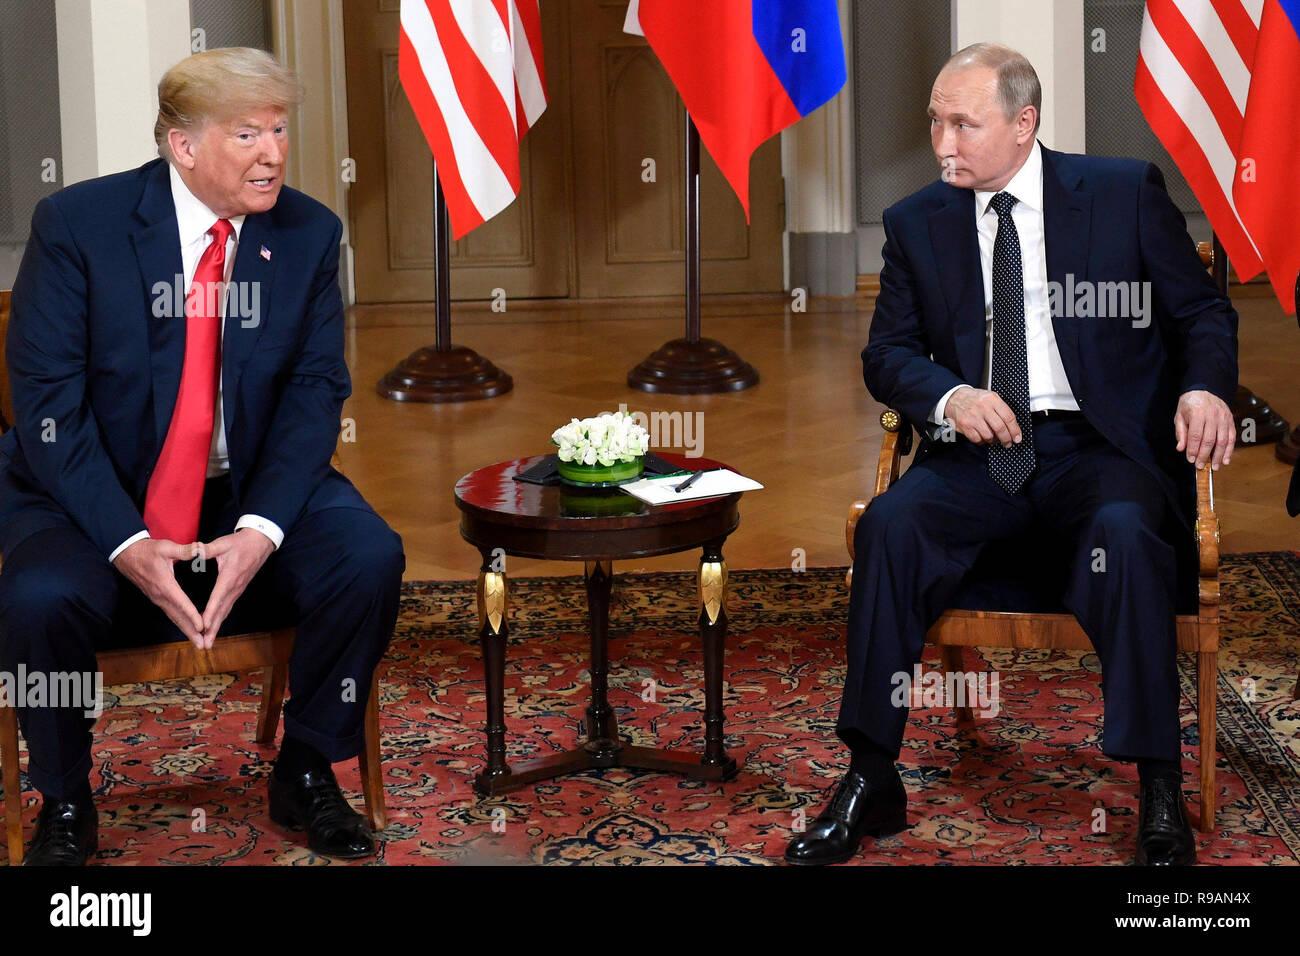 Beijing, Finland. 16th July, 2018. U.S. President Donald Trump (L) meets with his Russian counterpart Vladimir Putin in Helsinki, Finland, on July 16, 2018. Credit: Lehtikuva/Heikki Saukkomaa/Xinhua/Alamy Live News Stock Photo